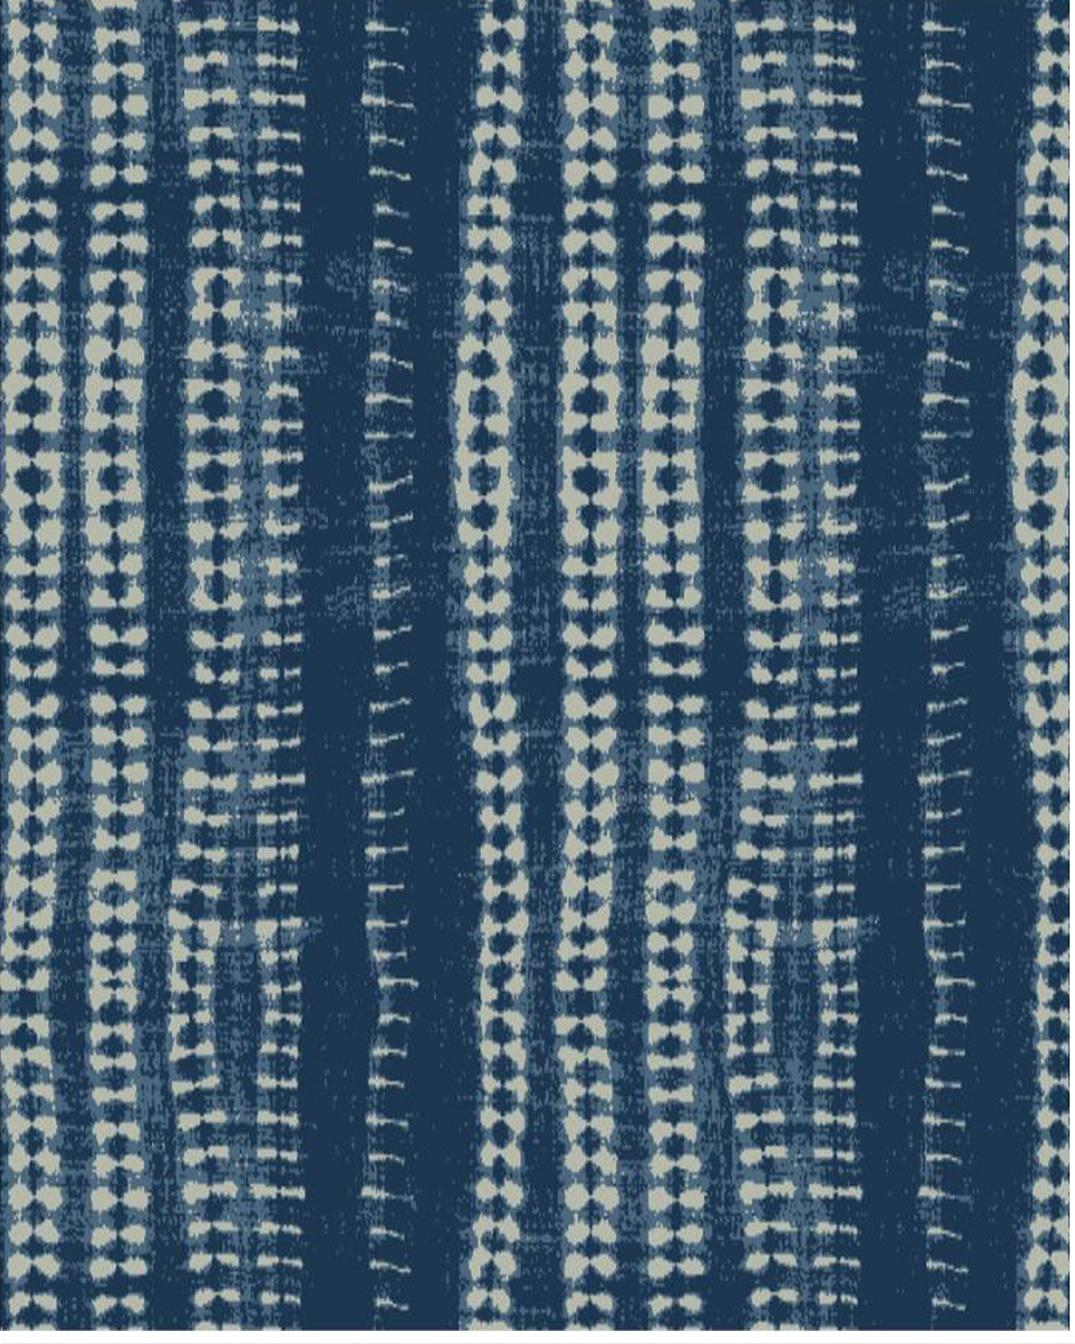 EF 6-17-18 RUG 3 , 8X10 , 100 Knots (Design Plate) (3).jpg